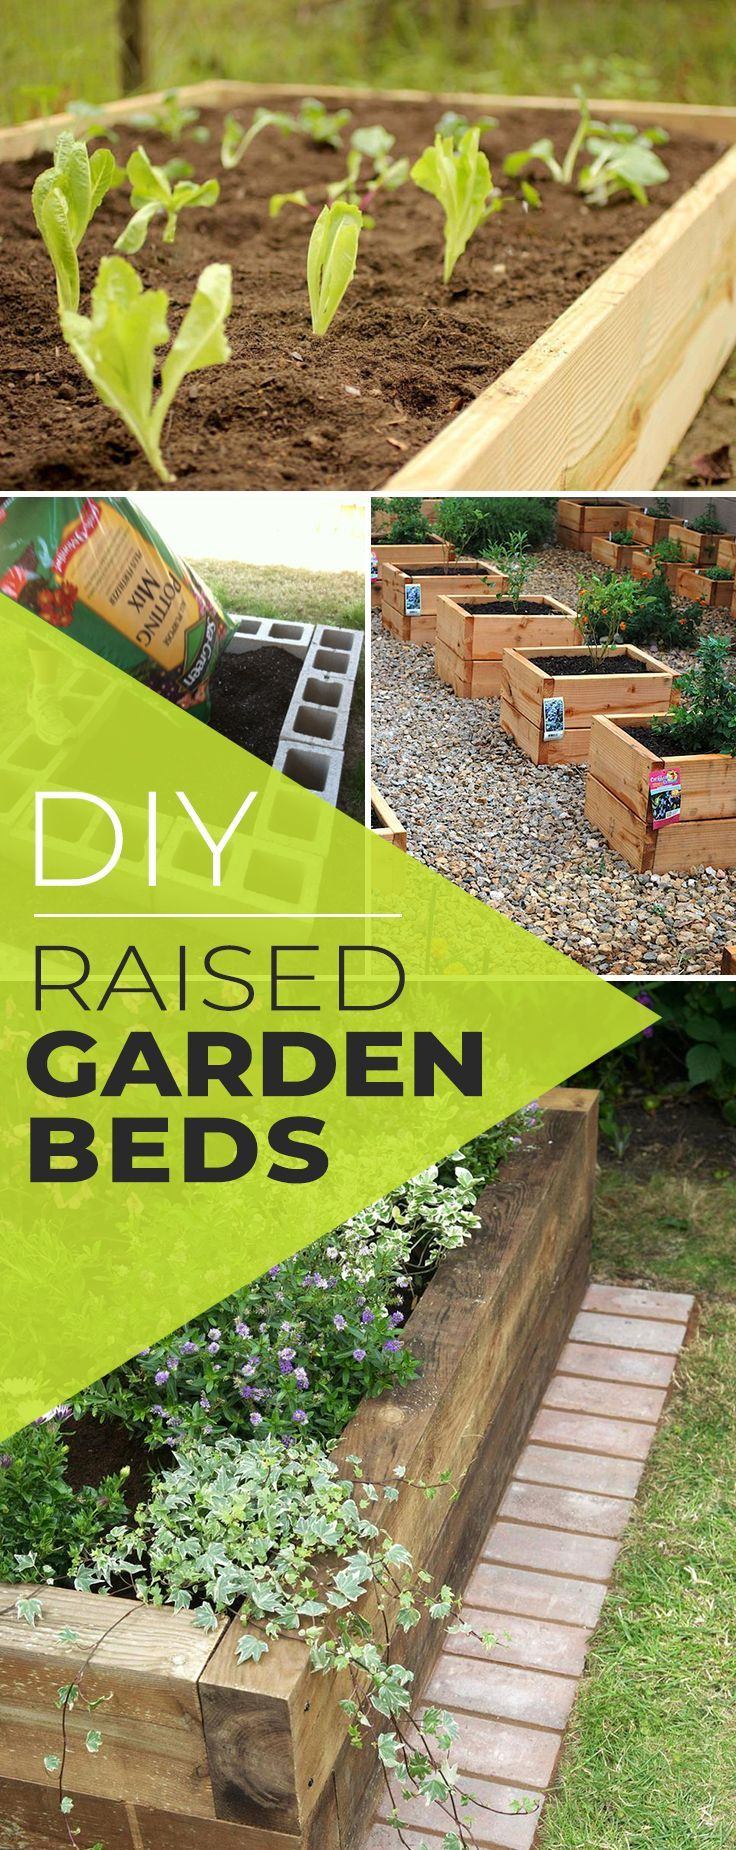 Diy Raised Garden Beds Planter Boxes Building A Raised 640 x 480